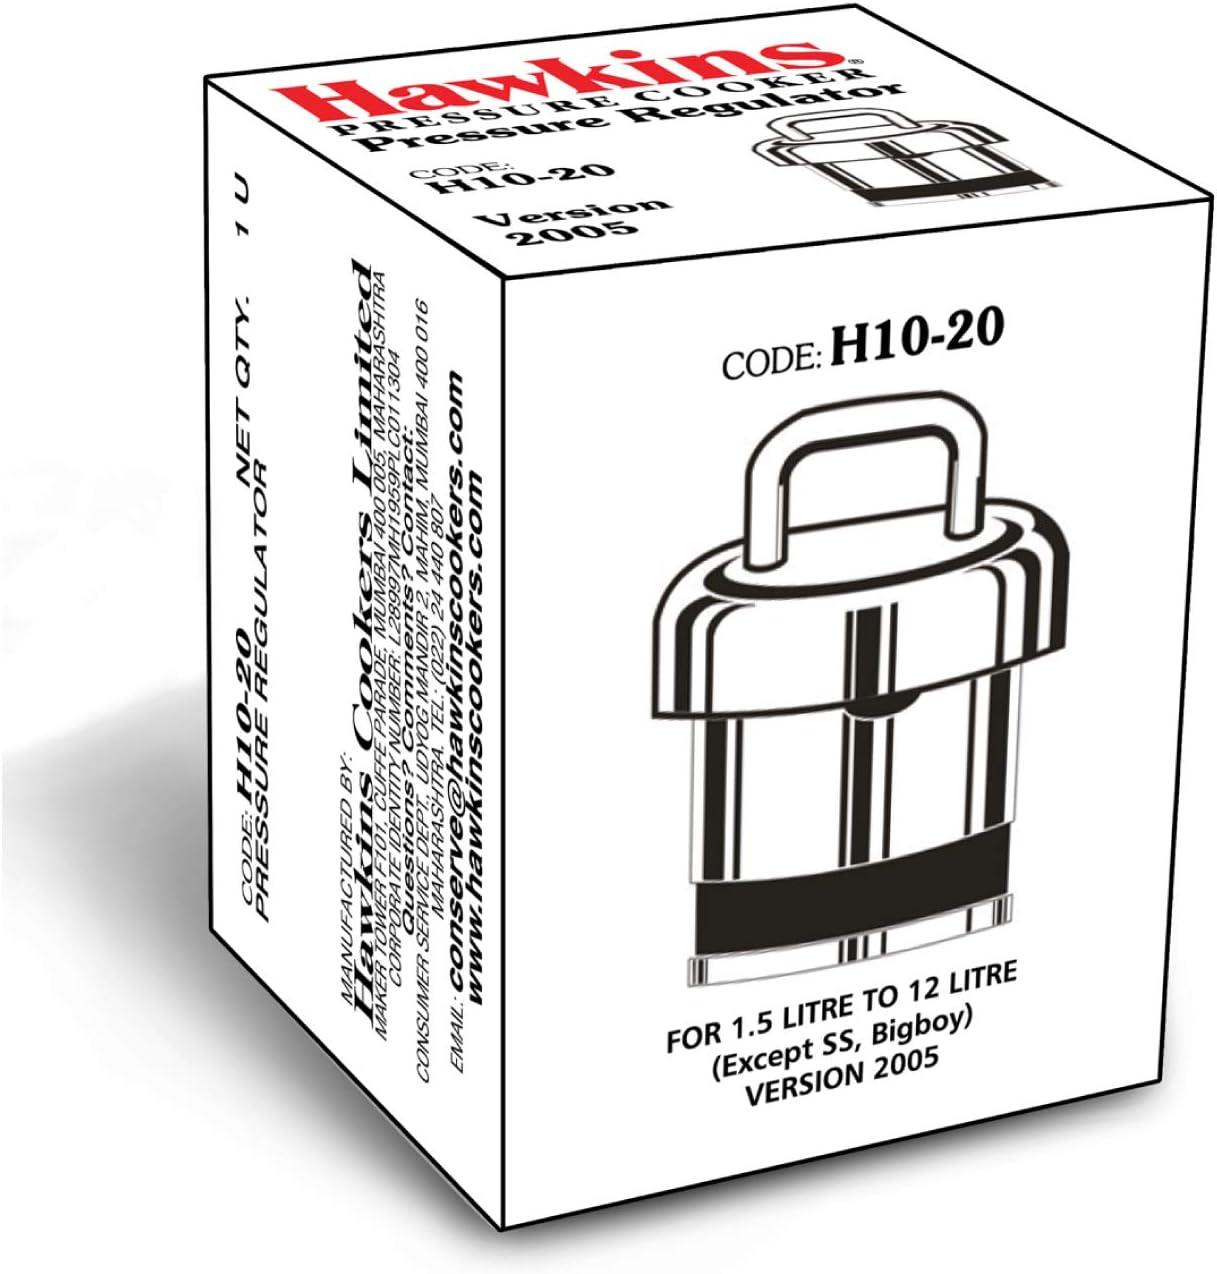 Hawkins Pressure Regulator for Classic Aluminum and Stainless Steel Pressure Cookers